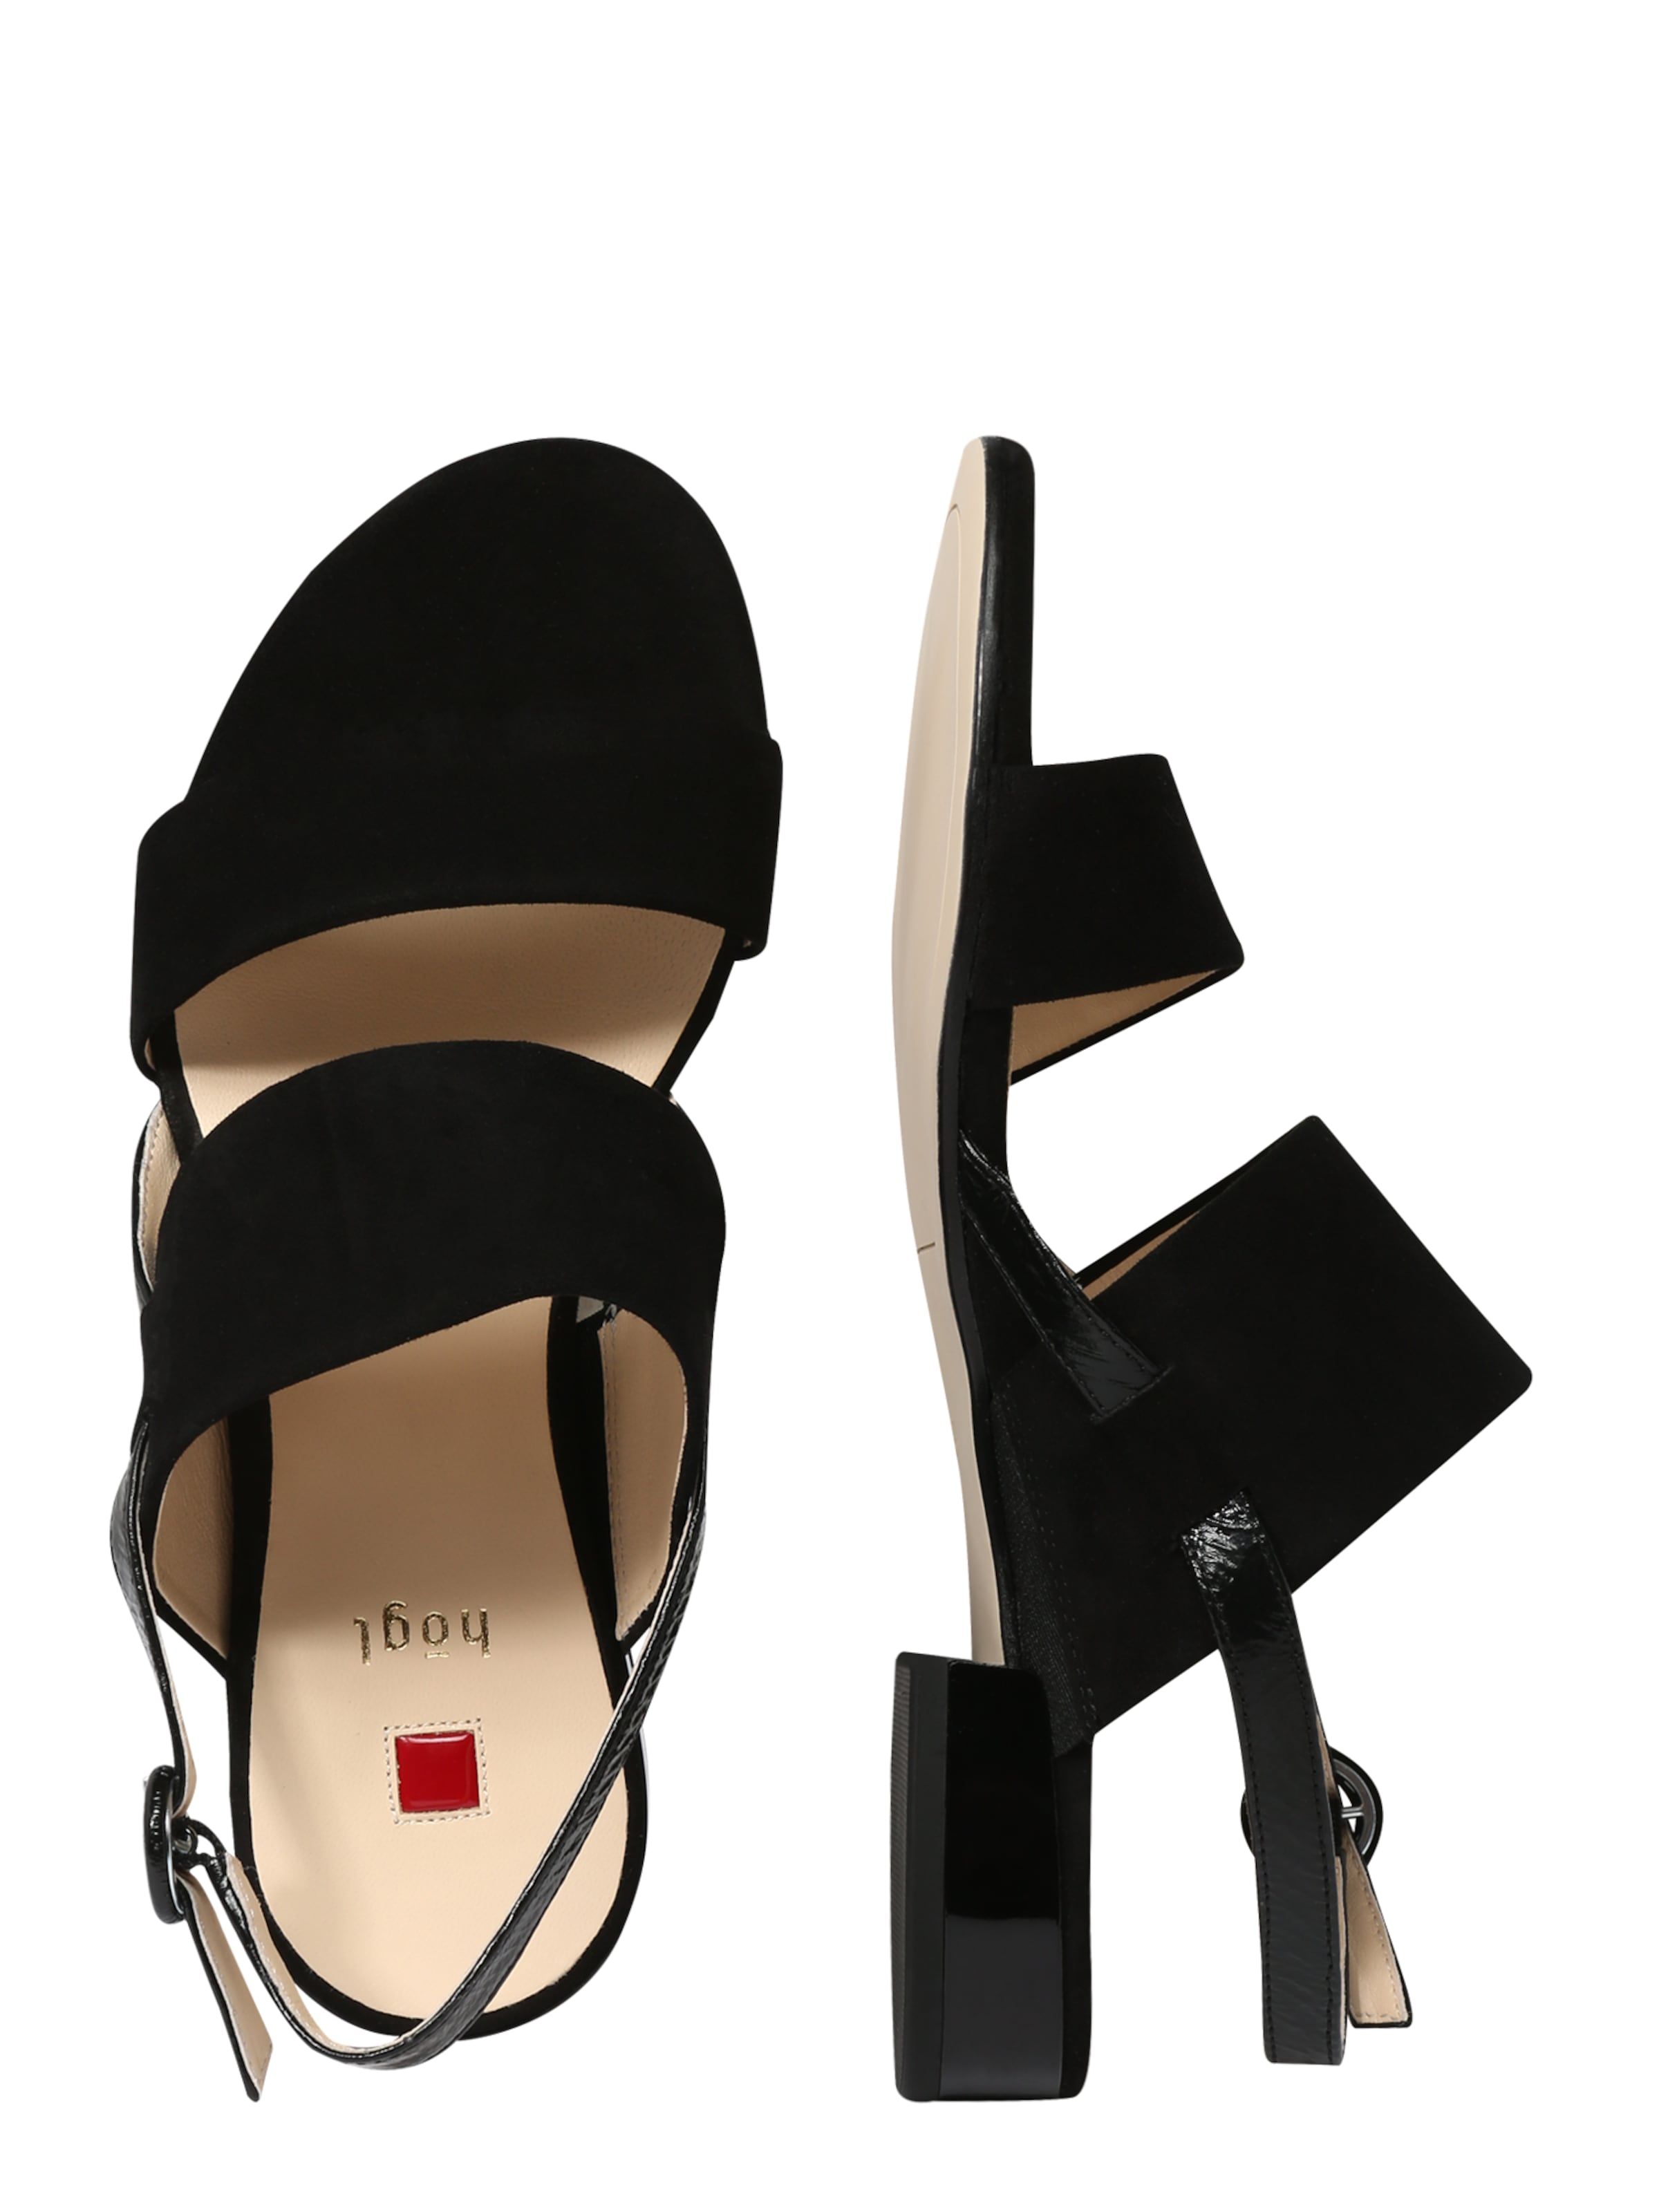 Zwart In Riem Met Velours' Högl Sandalen 'sandale jLSqMVpGzU